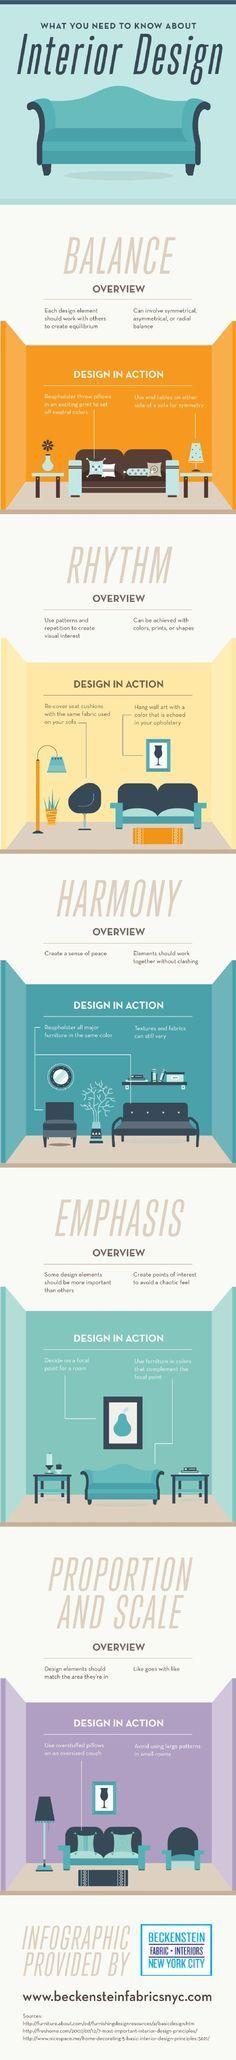 50 Interior Design Hacks #Infographic   Infographic, Interiors and ...